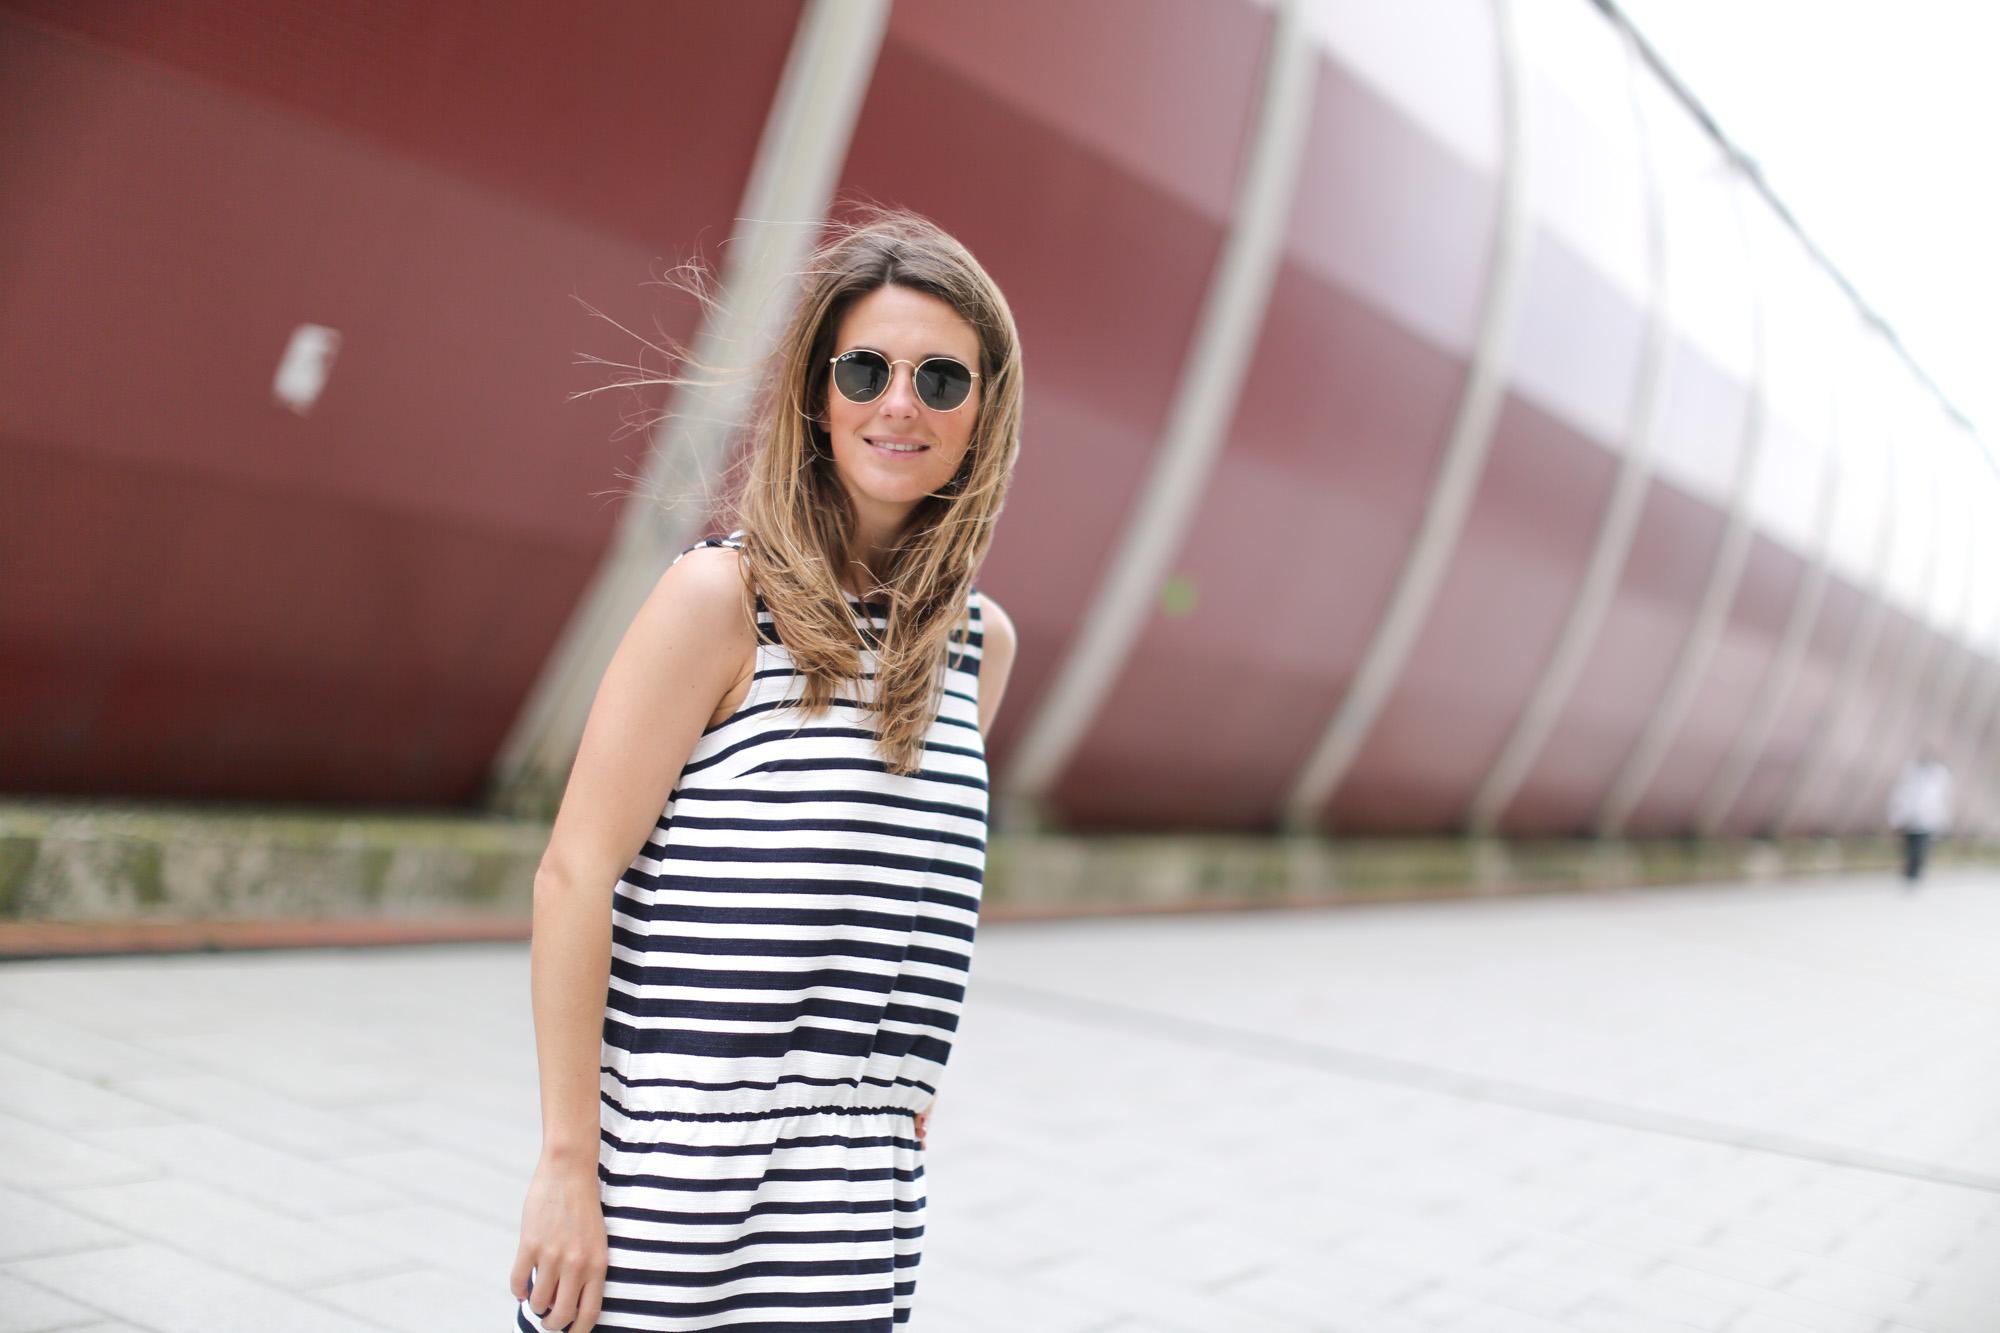 Clochet-streetstyle-suiteblanco-denim-jacket-stripped-dress-superga-classic-navy-6